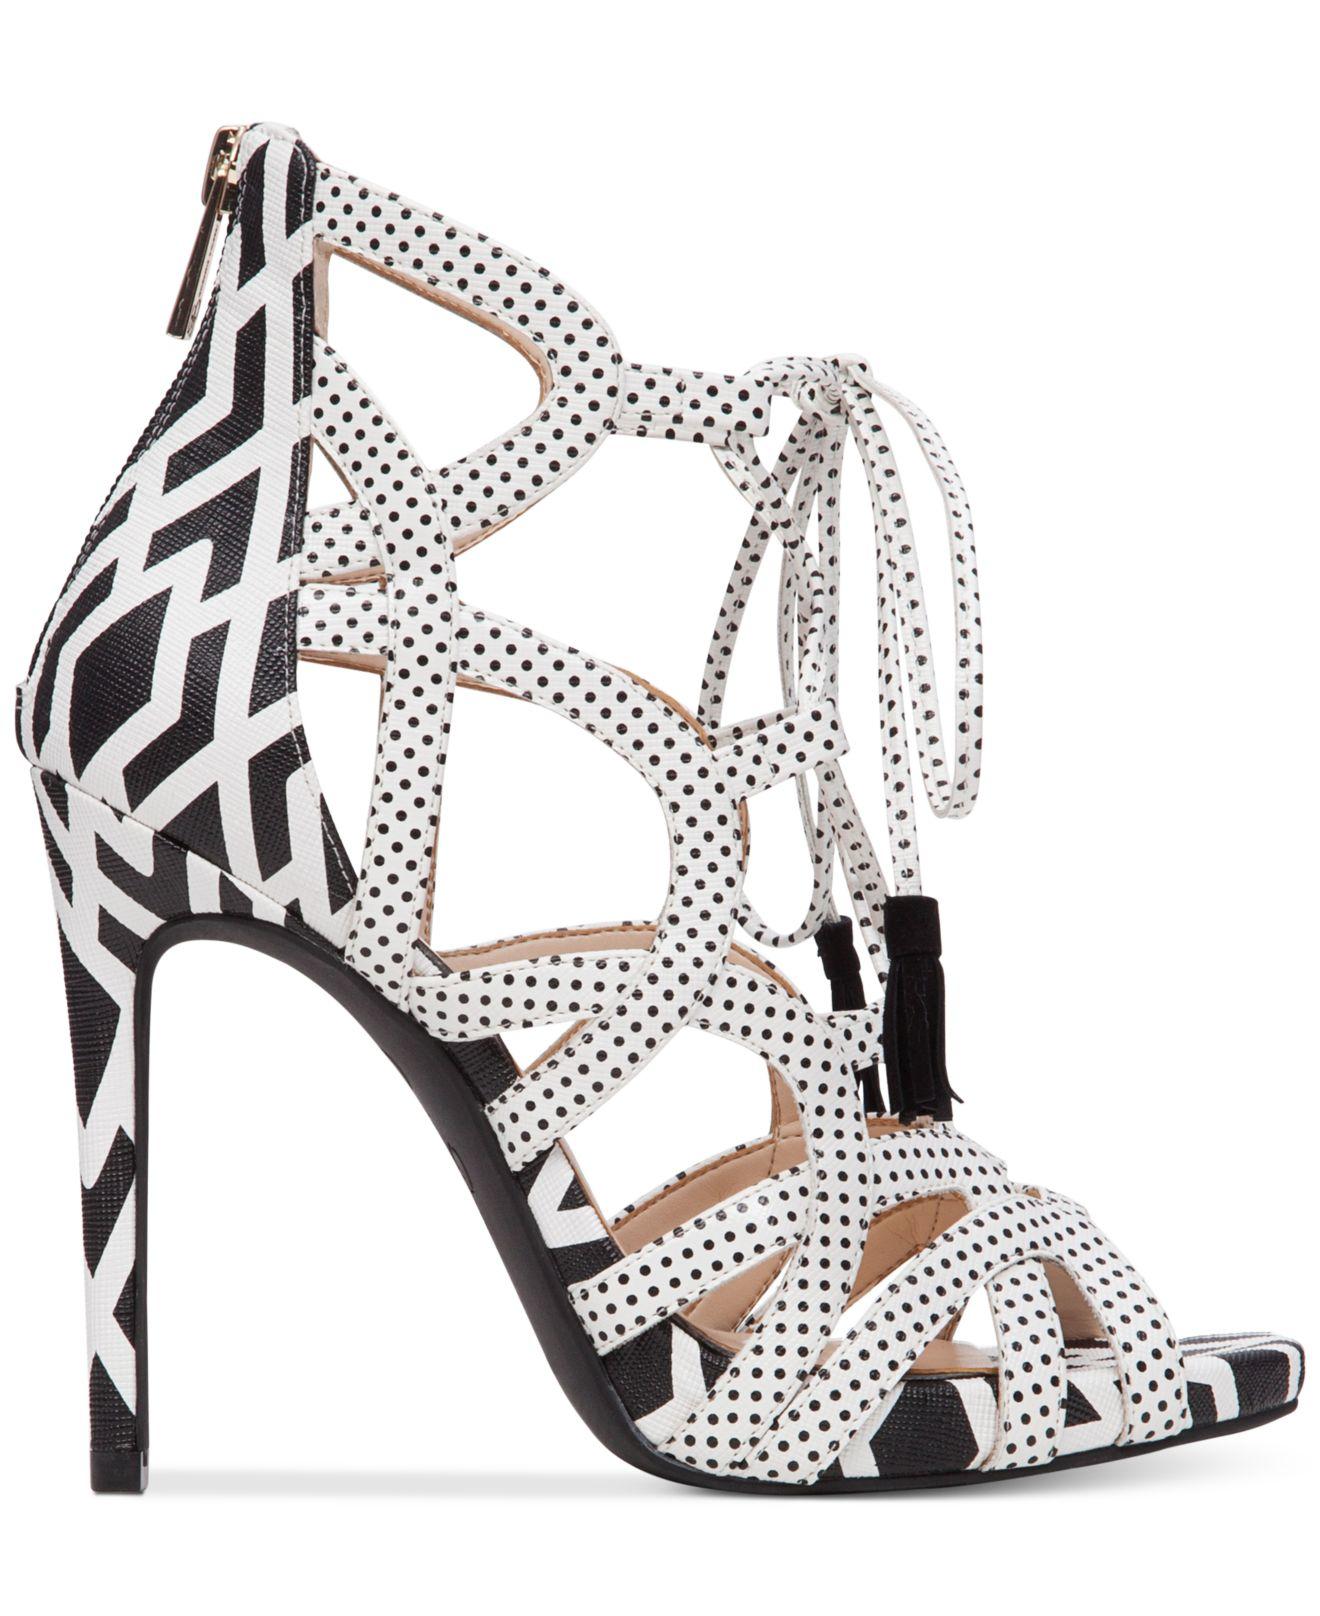 ea2e71e1663 Lyst - Jessica Simpson Racine Lace-up High-heel Gladiator Sandals in ...